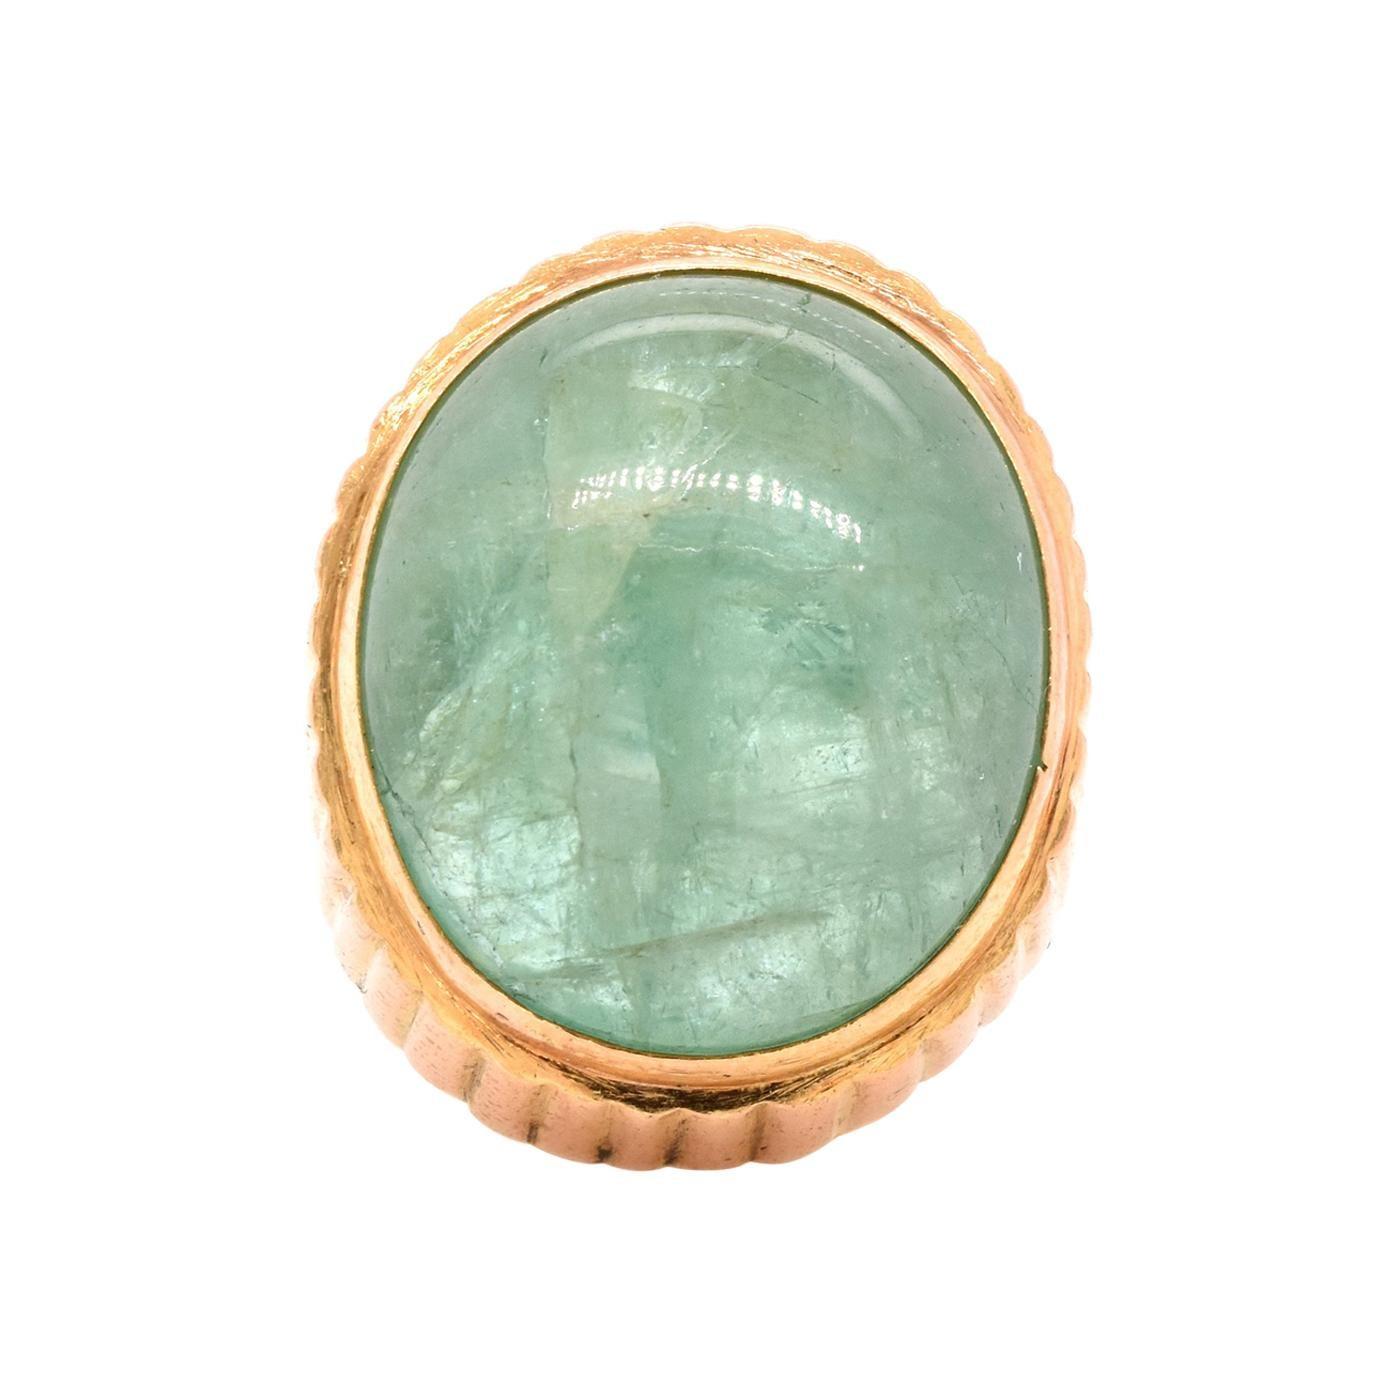 22 Karat Yellow Gold Cabochon Cut Emerald Ring